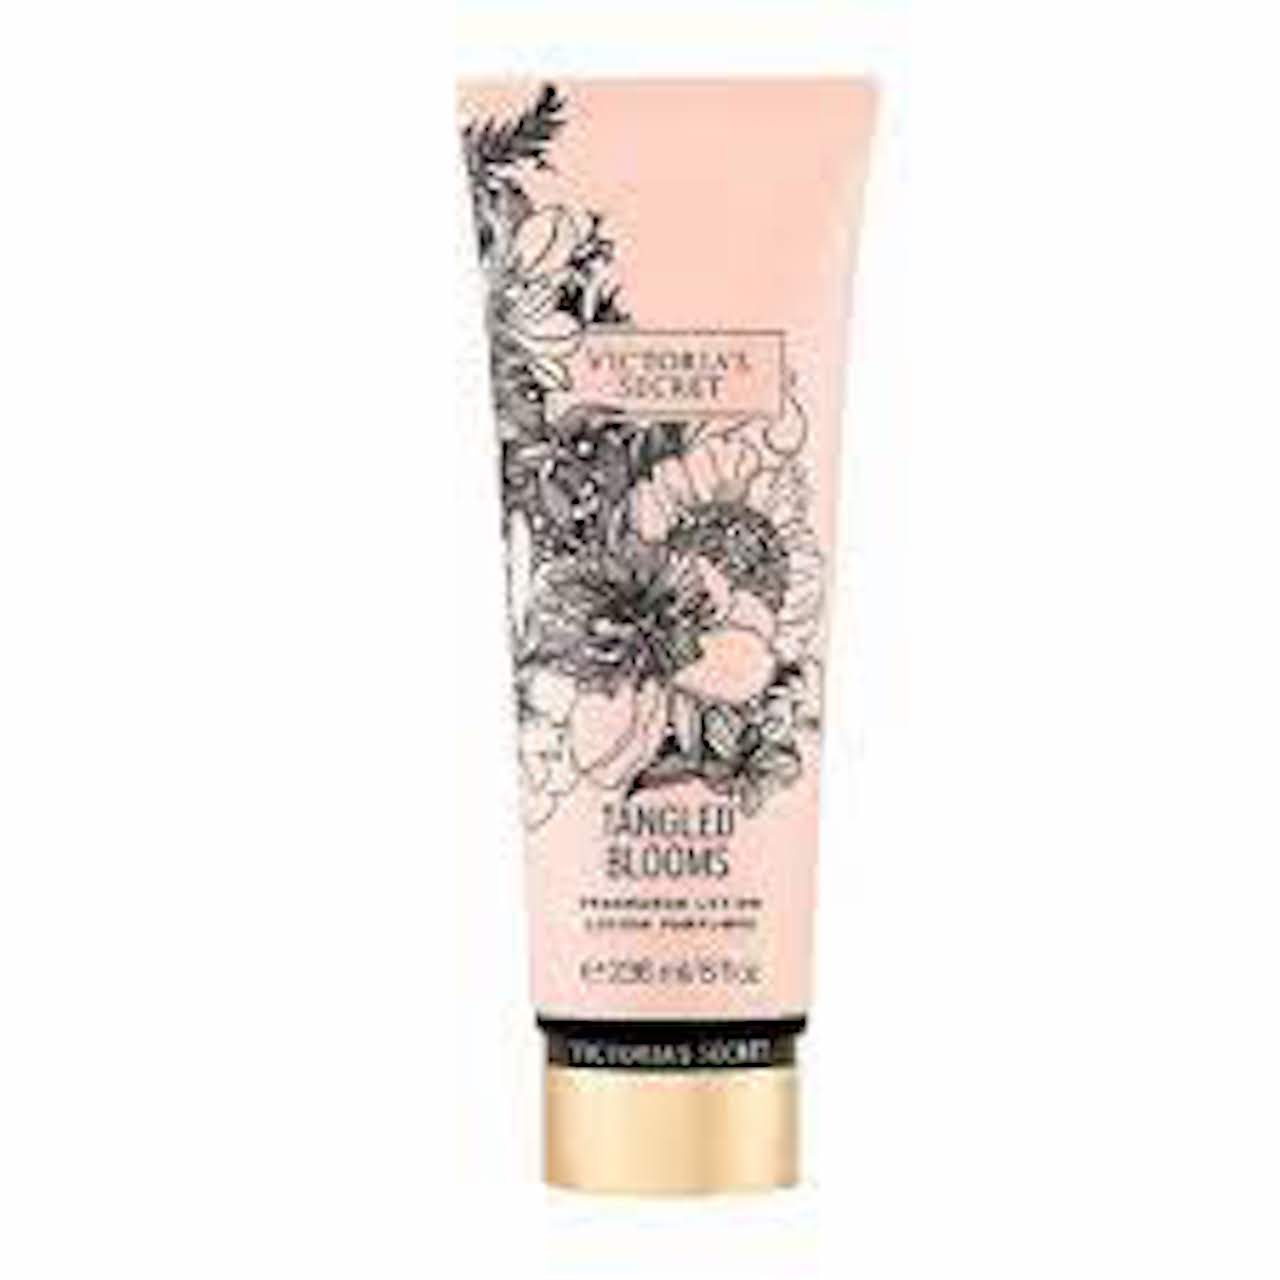 Dưỡng thể giữ ẩm da Victoria's Secret Fragrance Lotion Tangled Blooms 236ml (Mỹ)